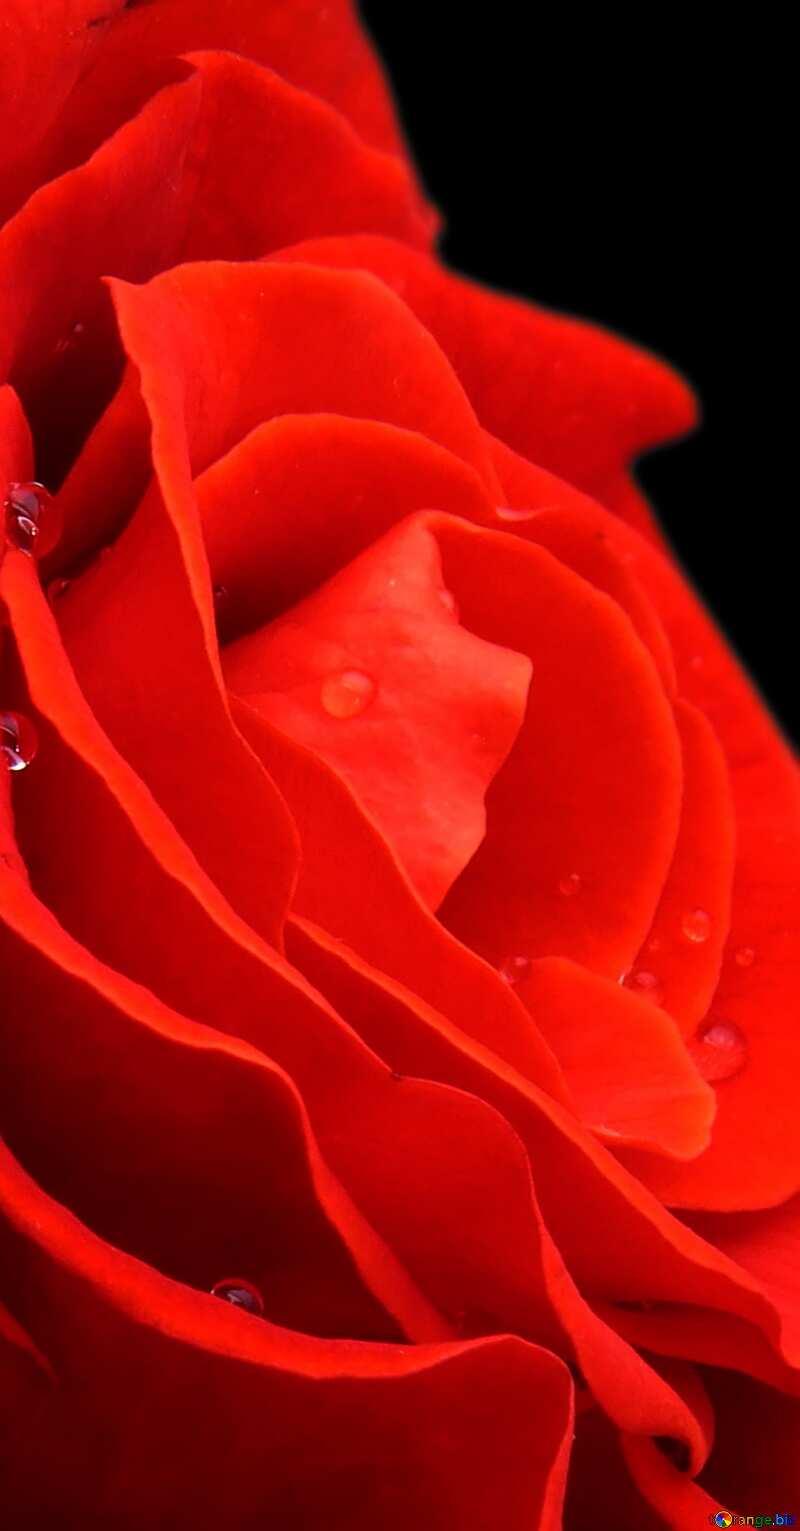 Red flower rose №17106